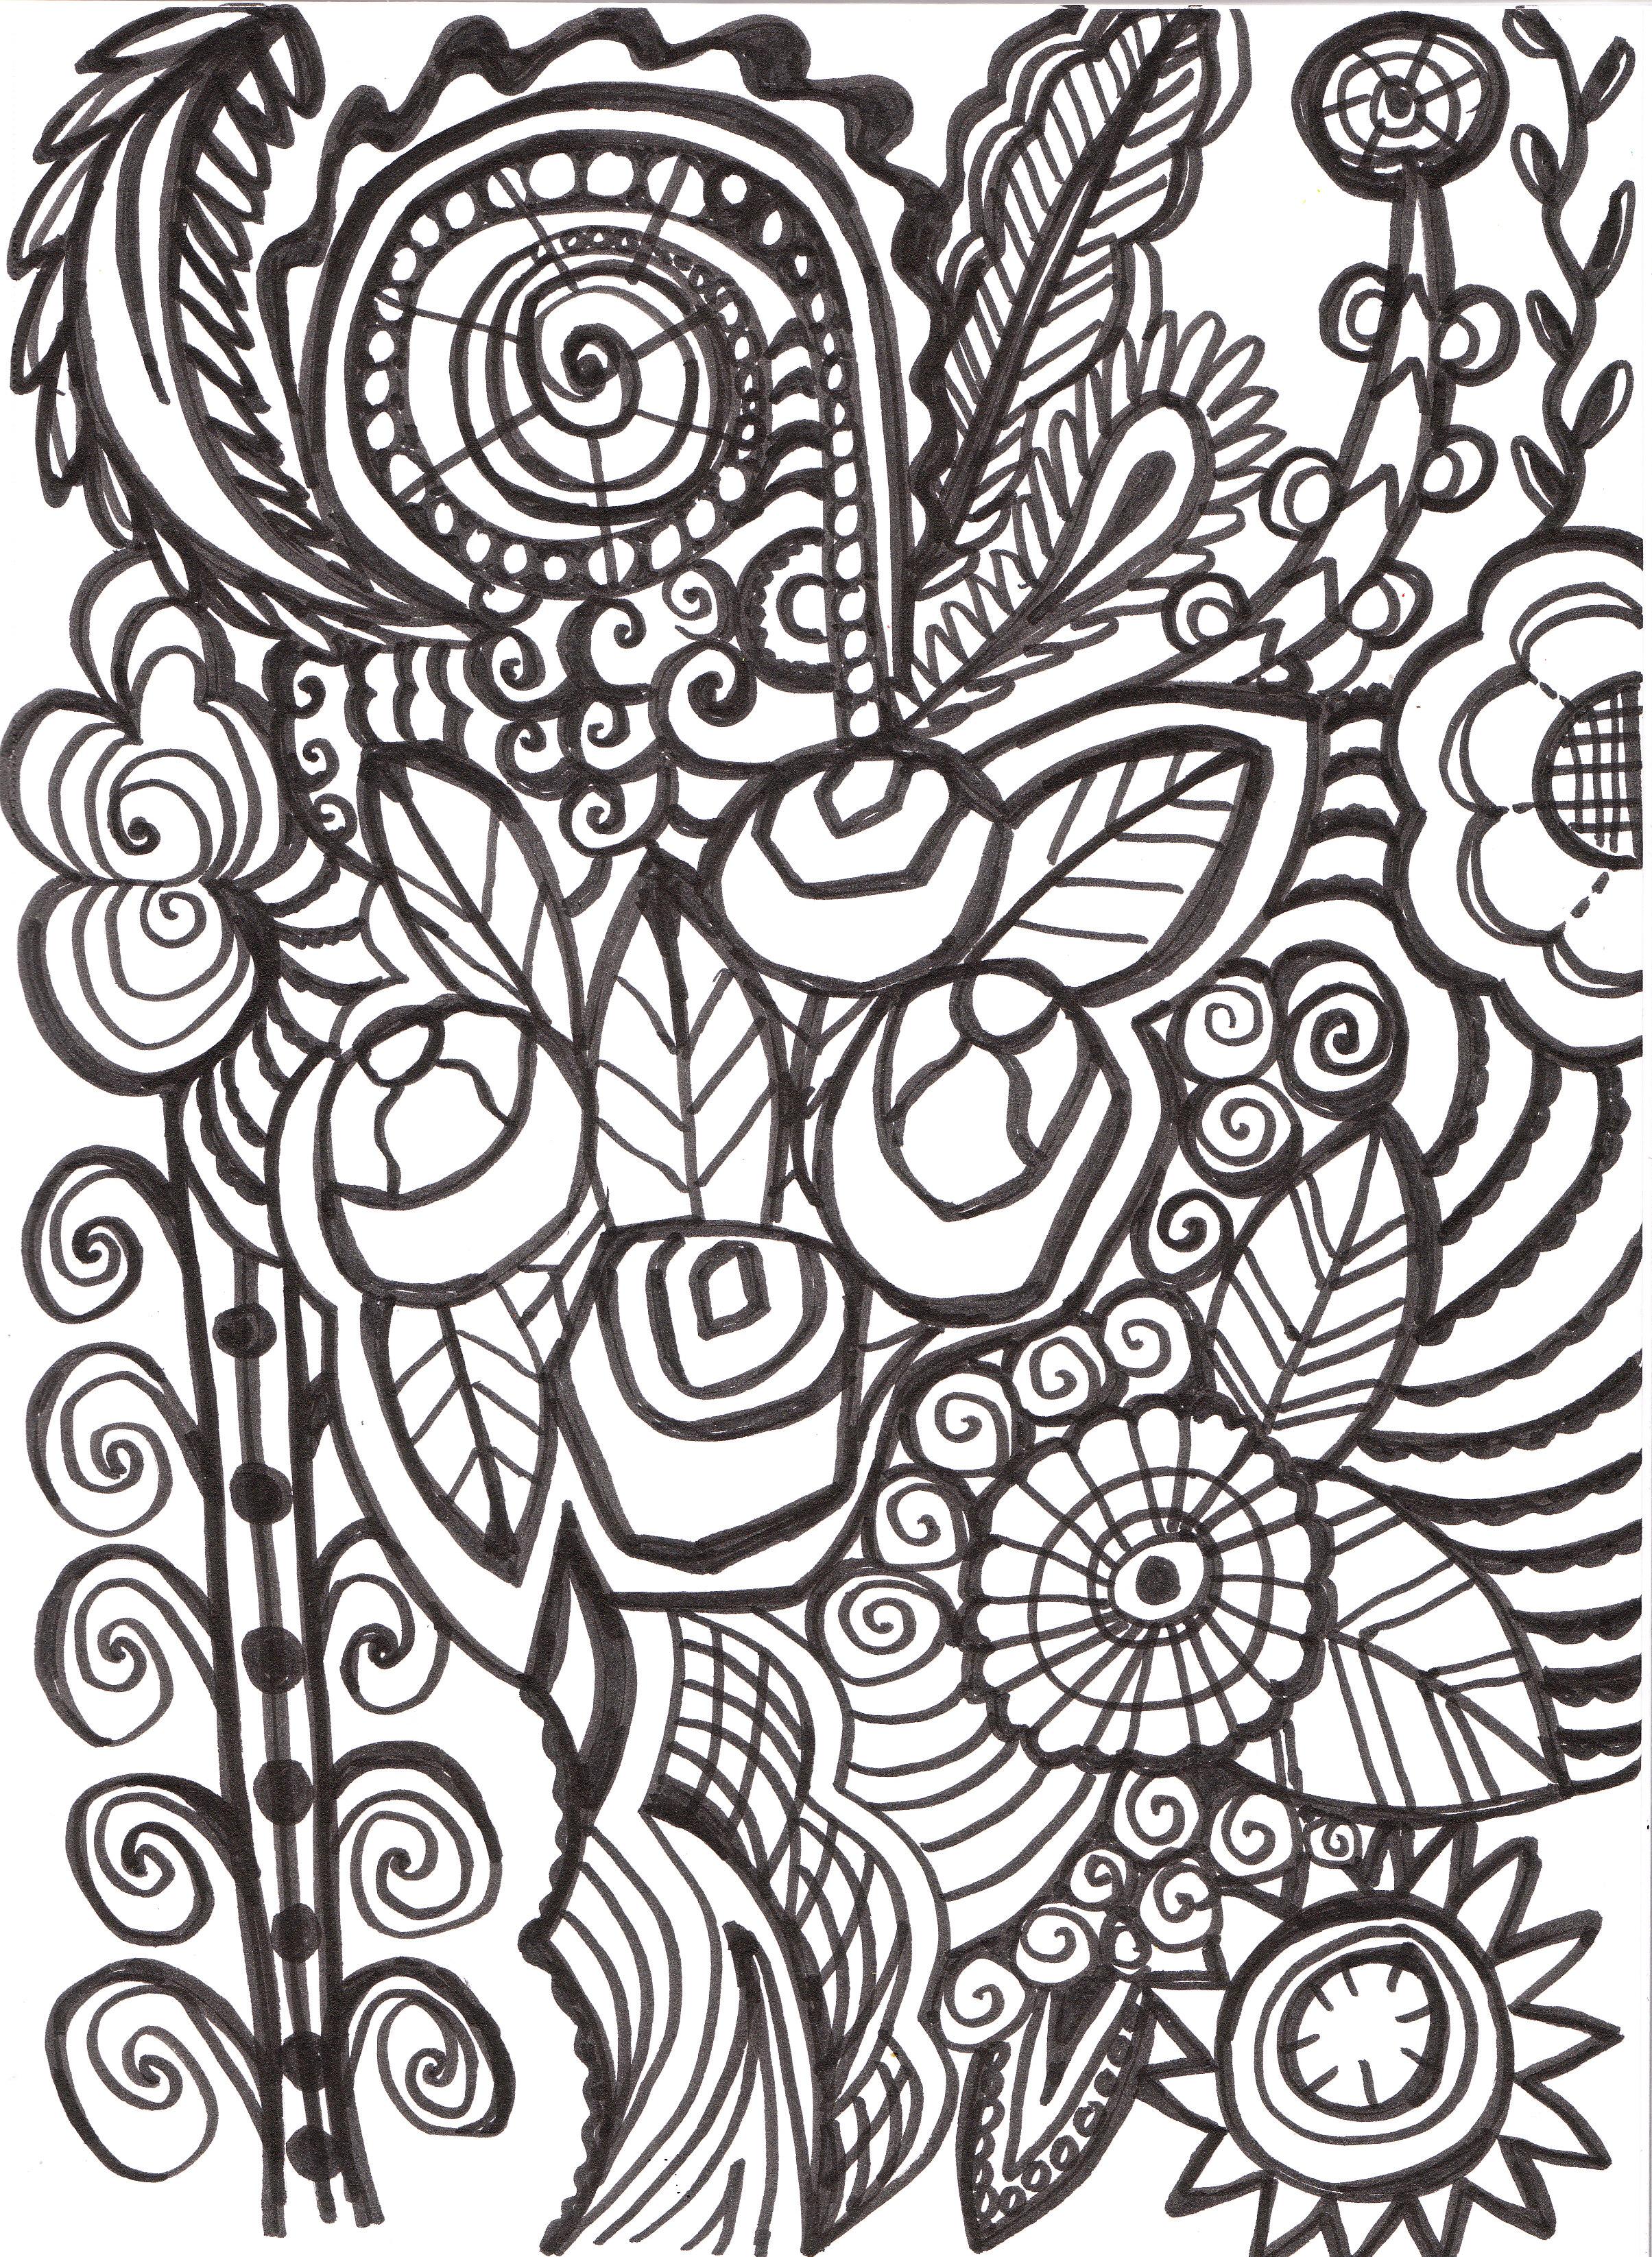 Miscellaneous doodles joyful ploys - Doodle dessin ...